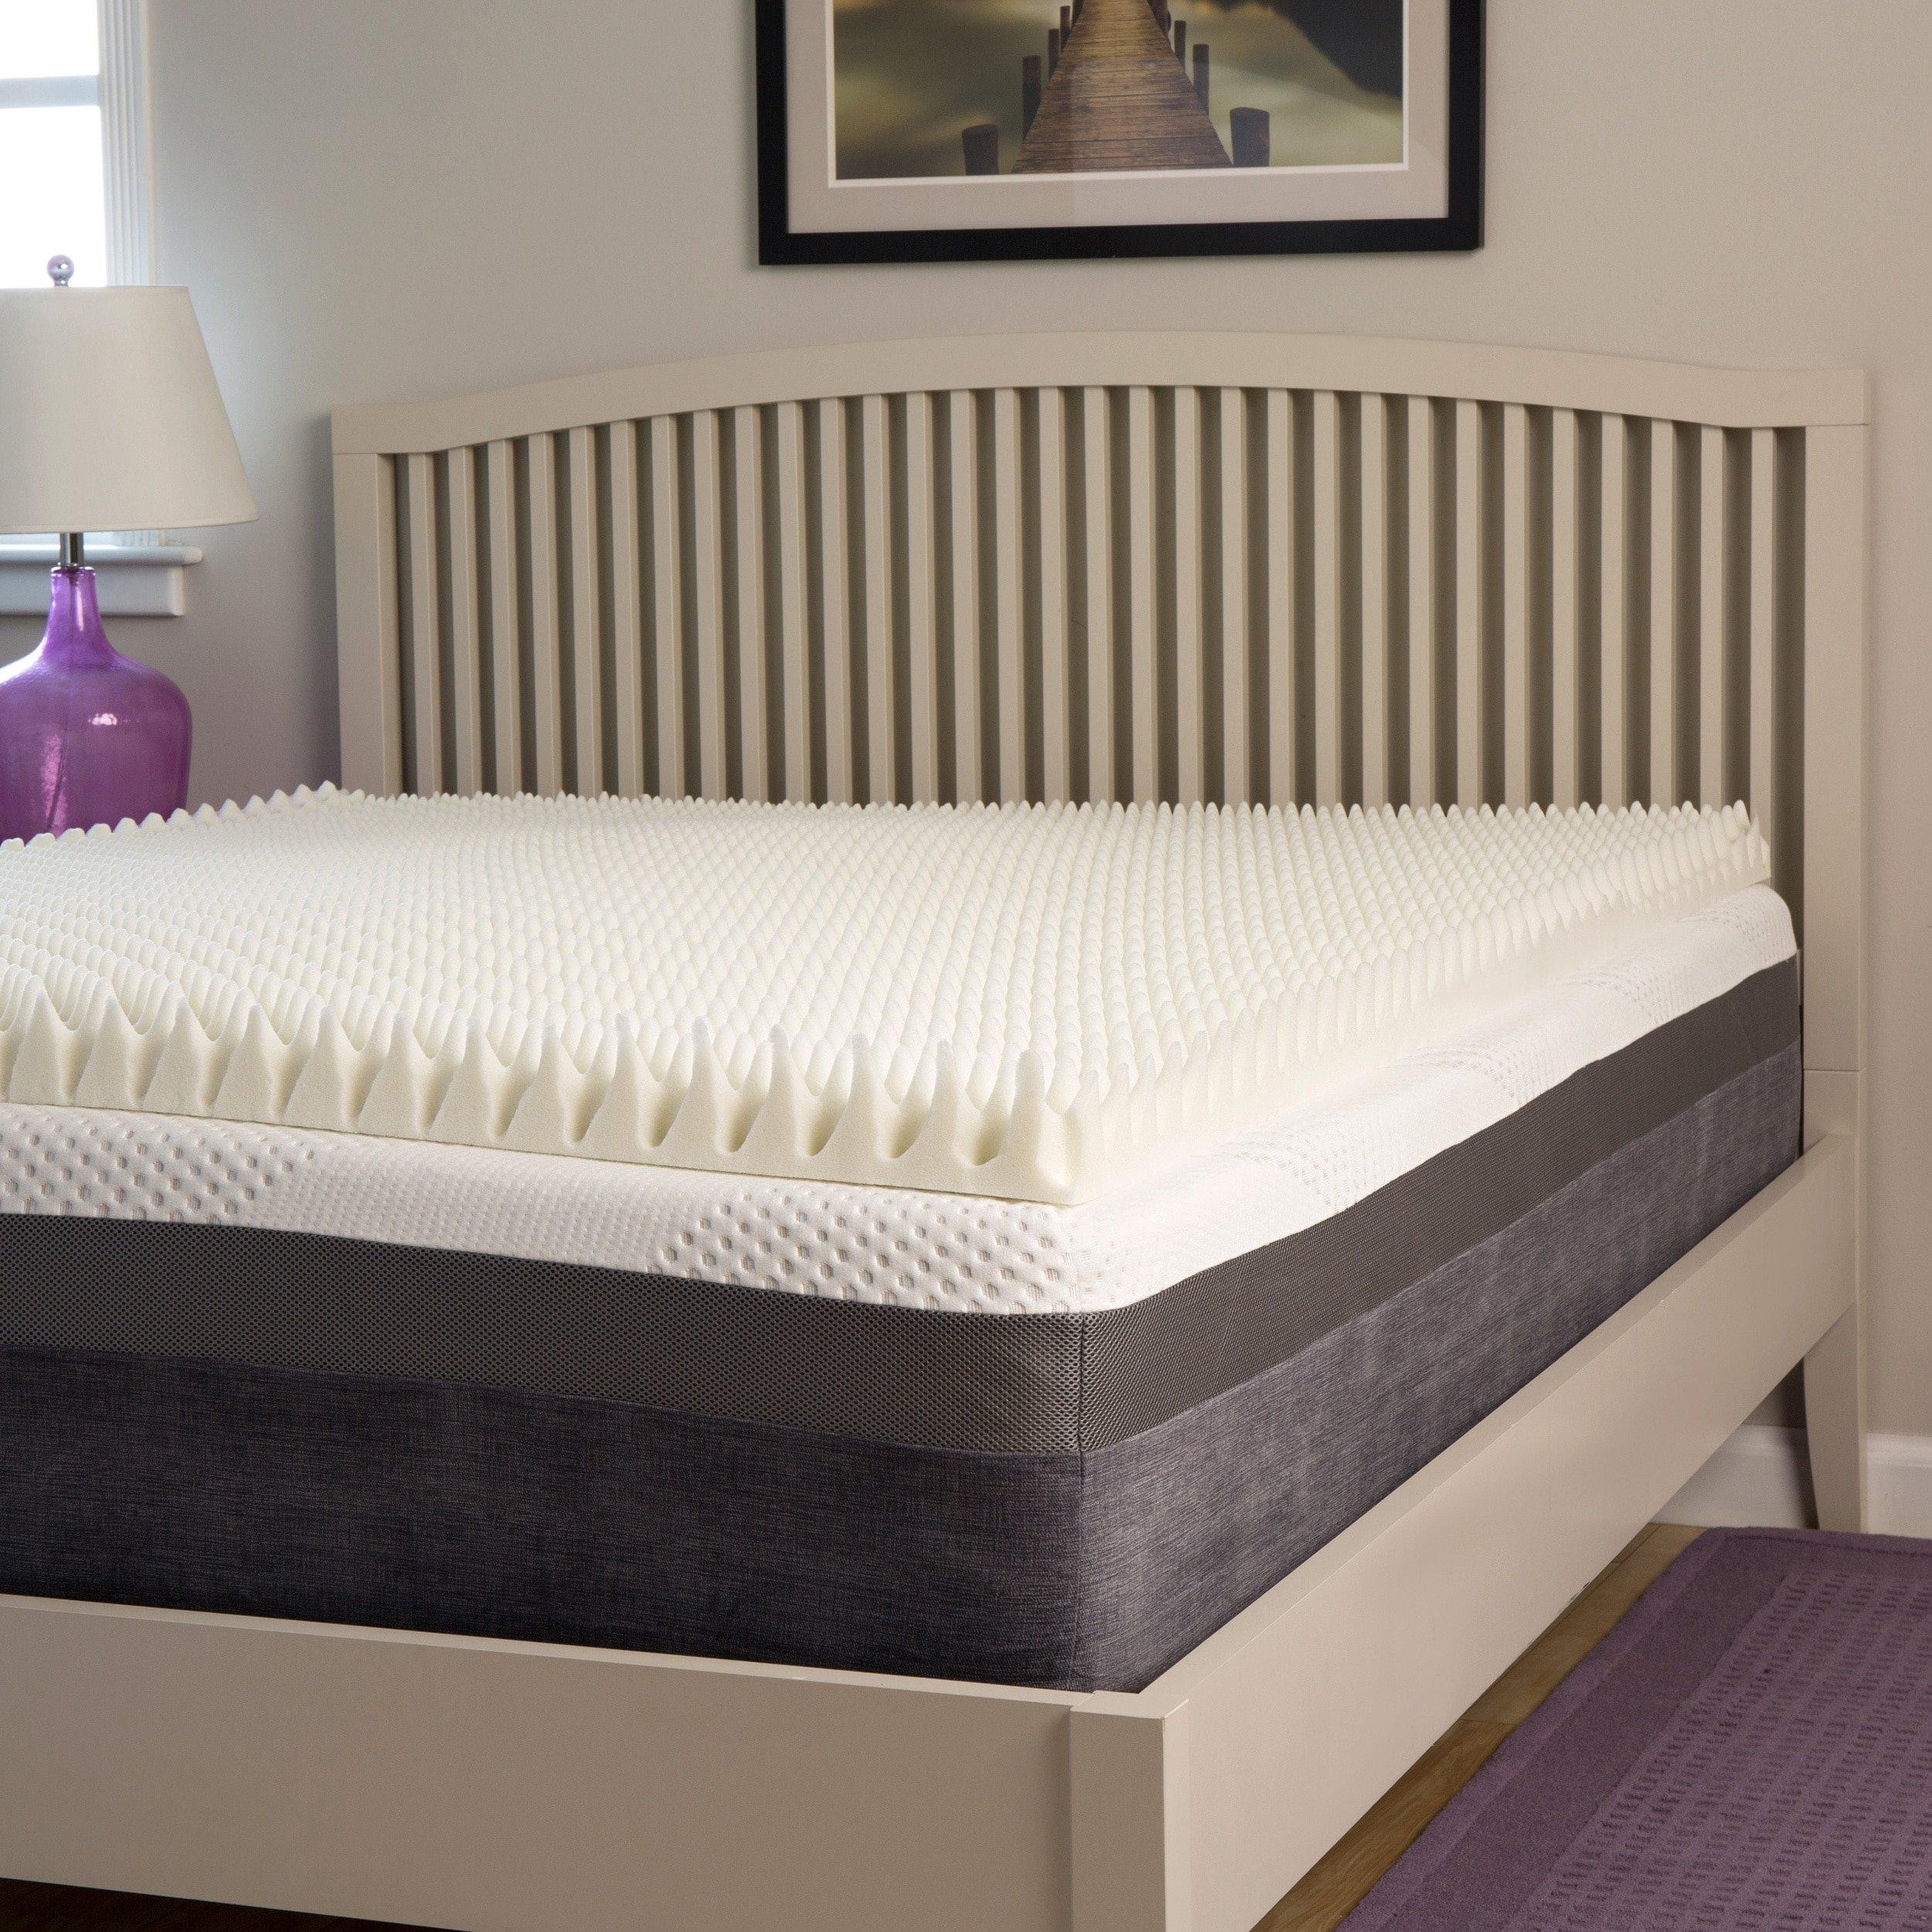 Slumber Perfect Highloft Supreme 3-inch Convoluted Memory Foam Topper Twin